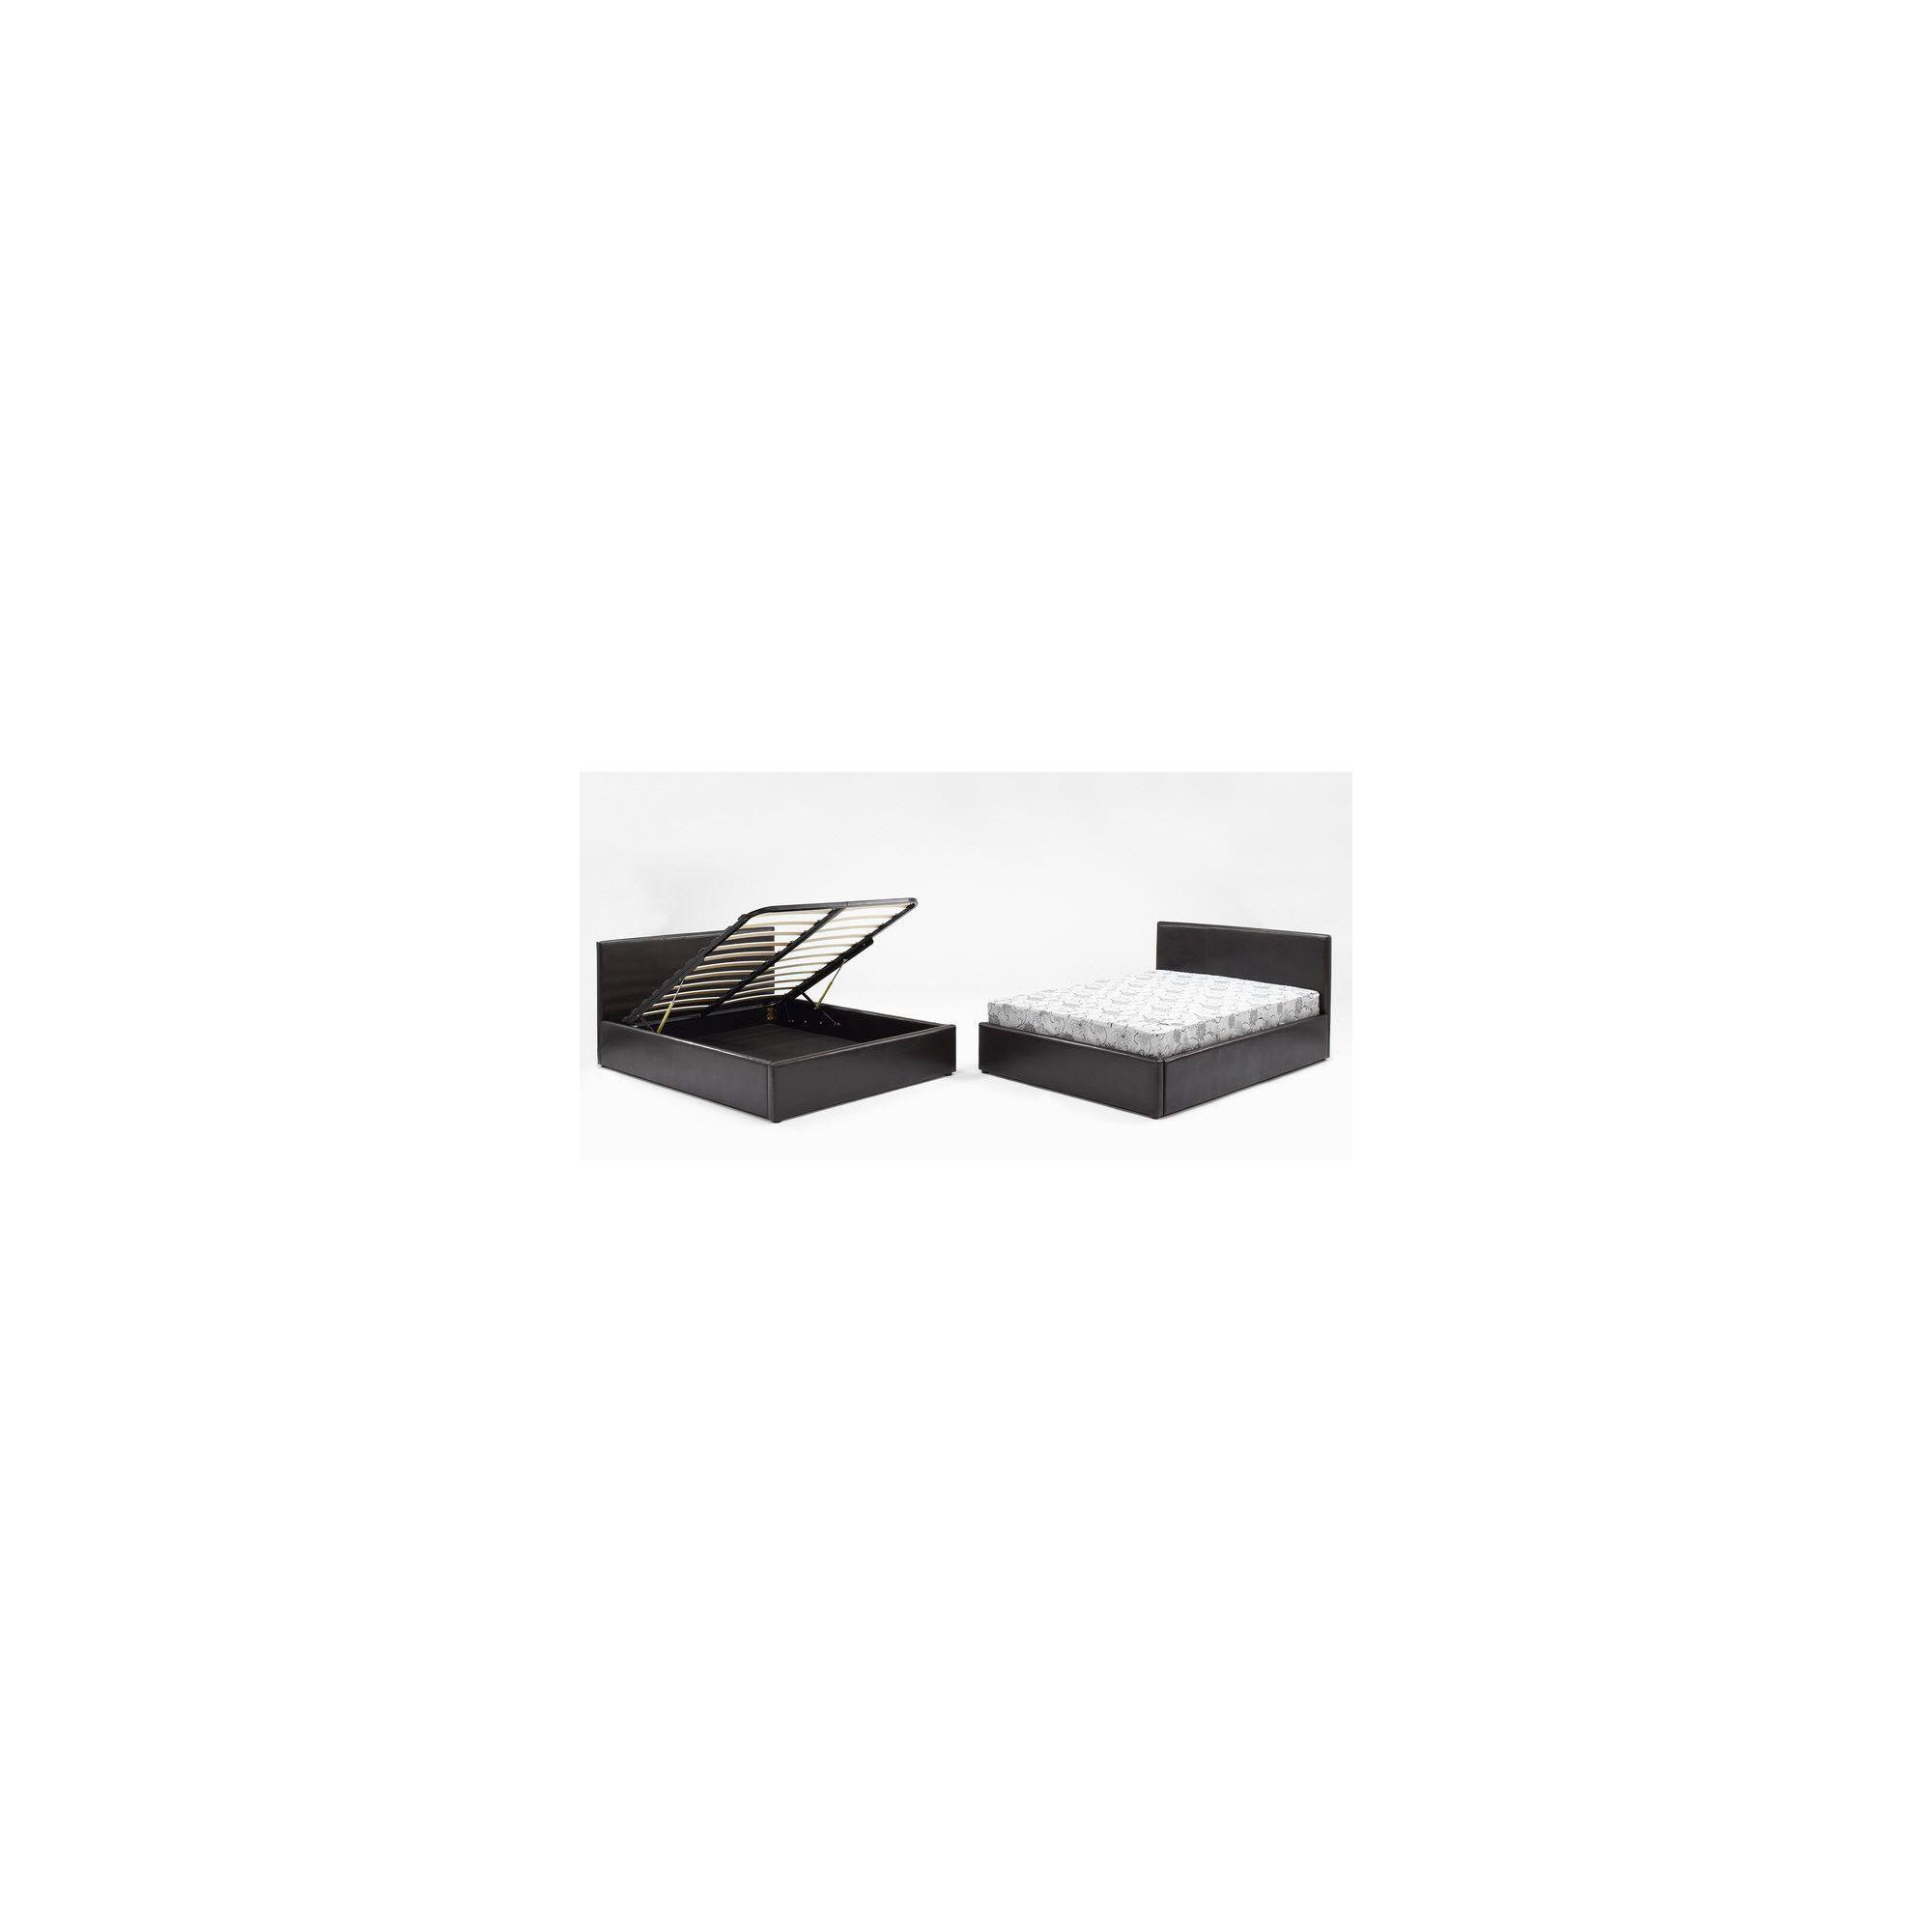 Interiors 2 suit Milan Storage Bedframe - Black - Double at Tescos Direct